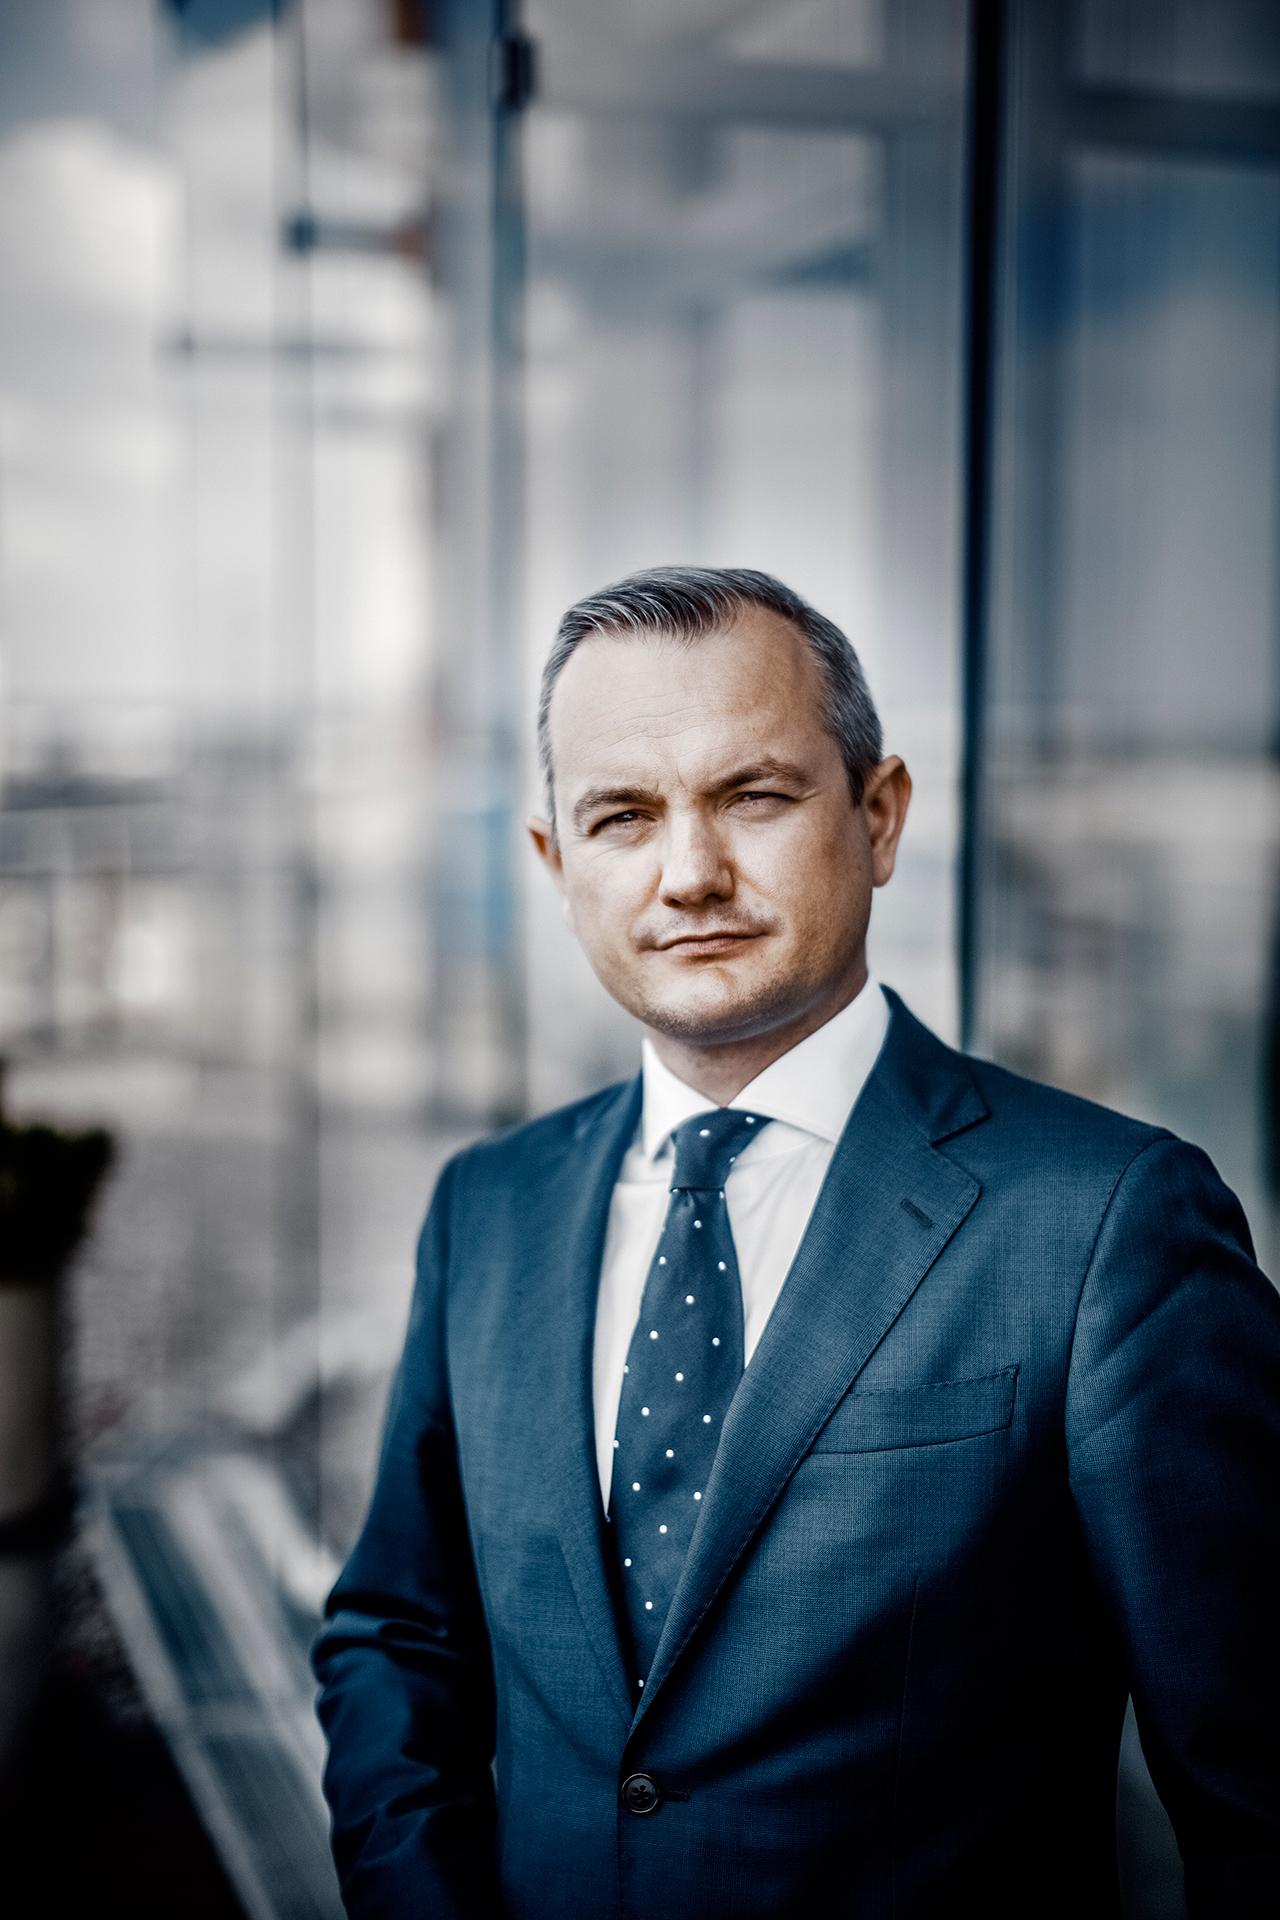 Robert Pietryszyn, prezes Zarządu Grupy LOTOS S.A.